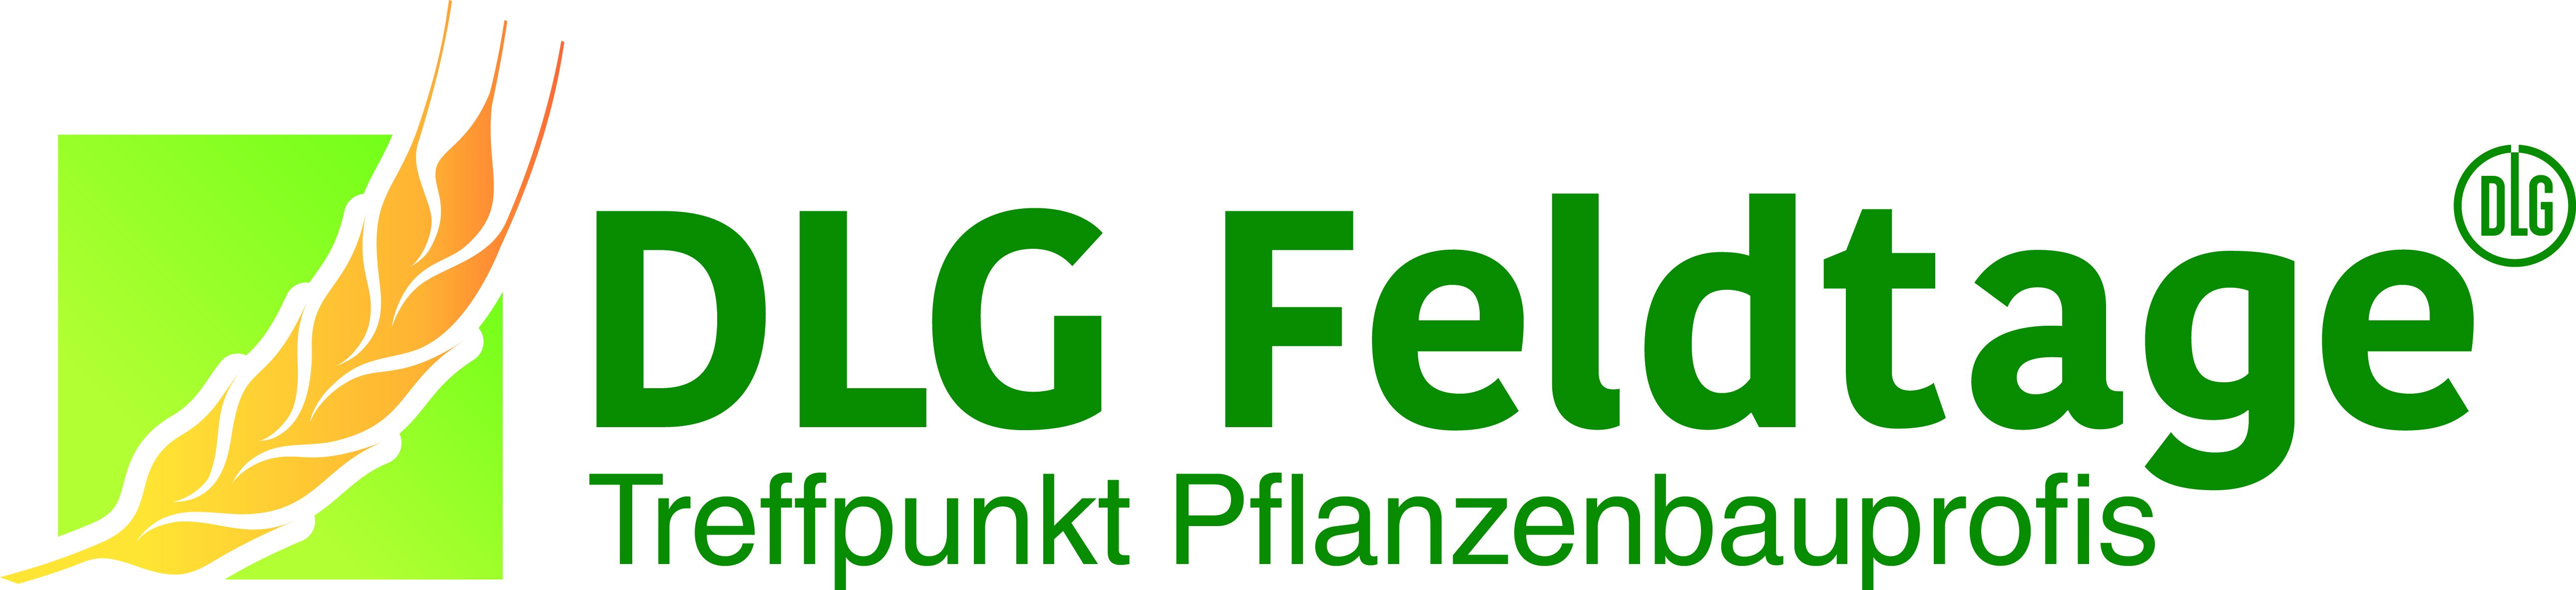 DLG_Feldtage_pos